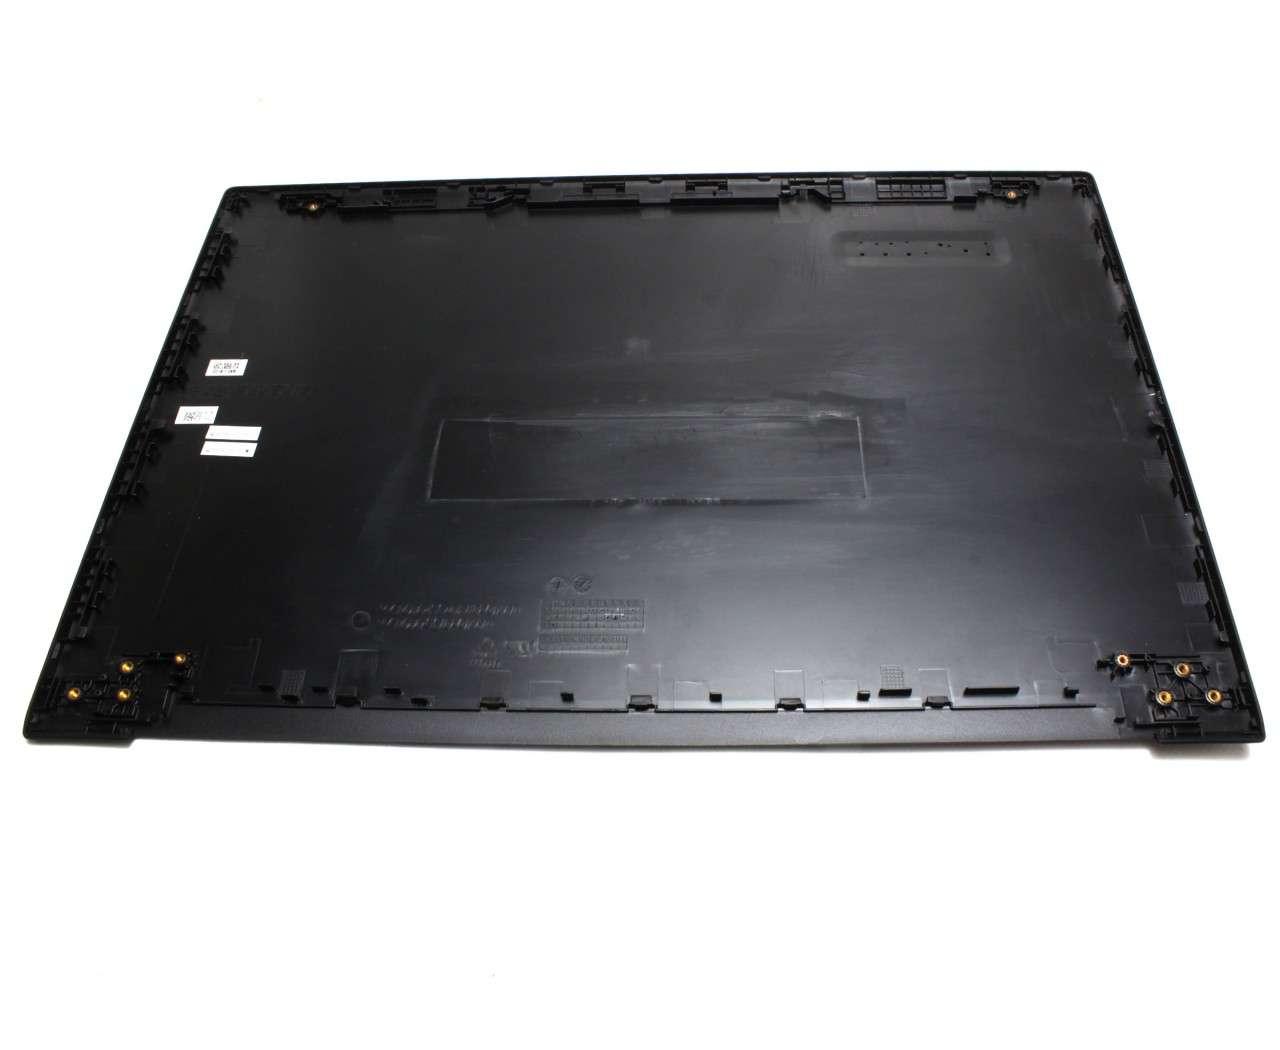 Capac Display BackCover Lenovo EALV9005010 Carcasa Display imagine powerlaptop.ro 2021